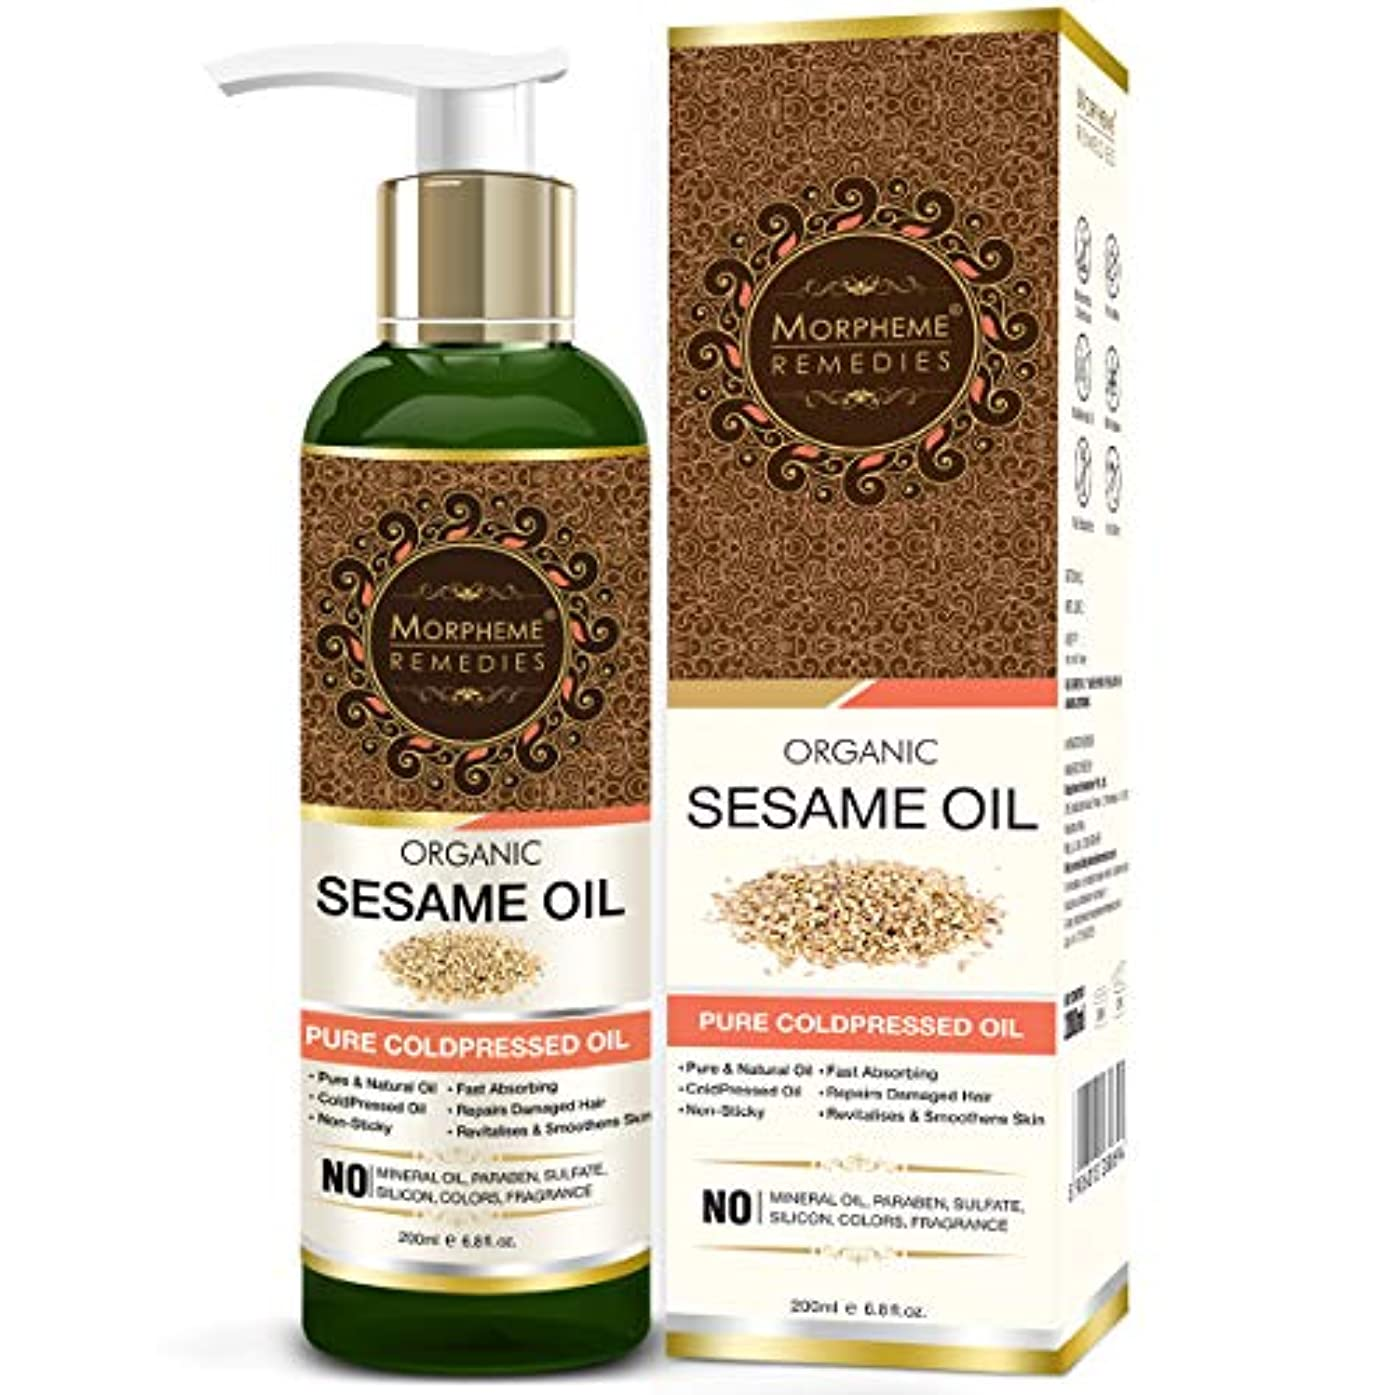 Morpheme Remedies Organic Sesame Oil (Pure ColdPressed Oil) For Hair, Body, Skin Care, Massage, 200 ml